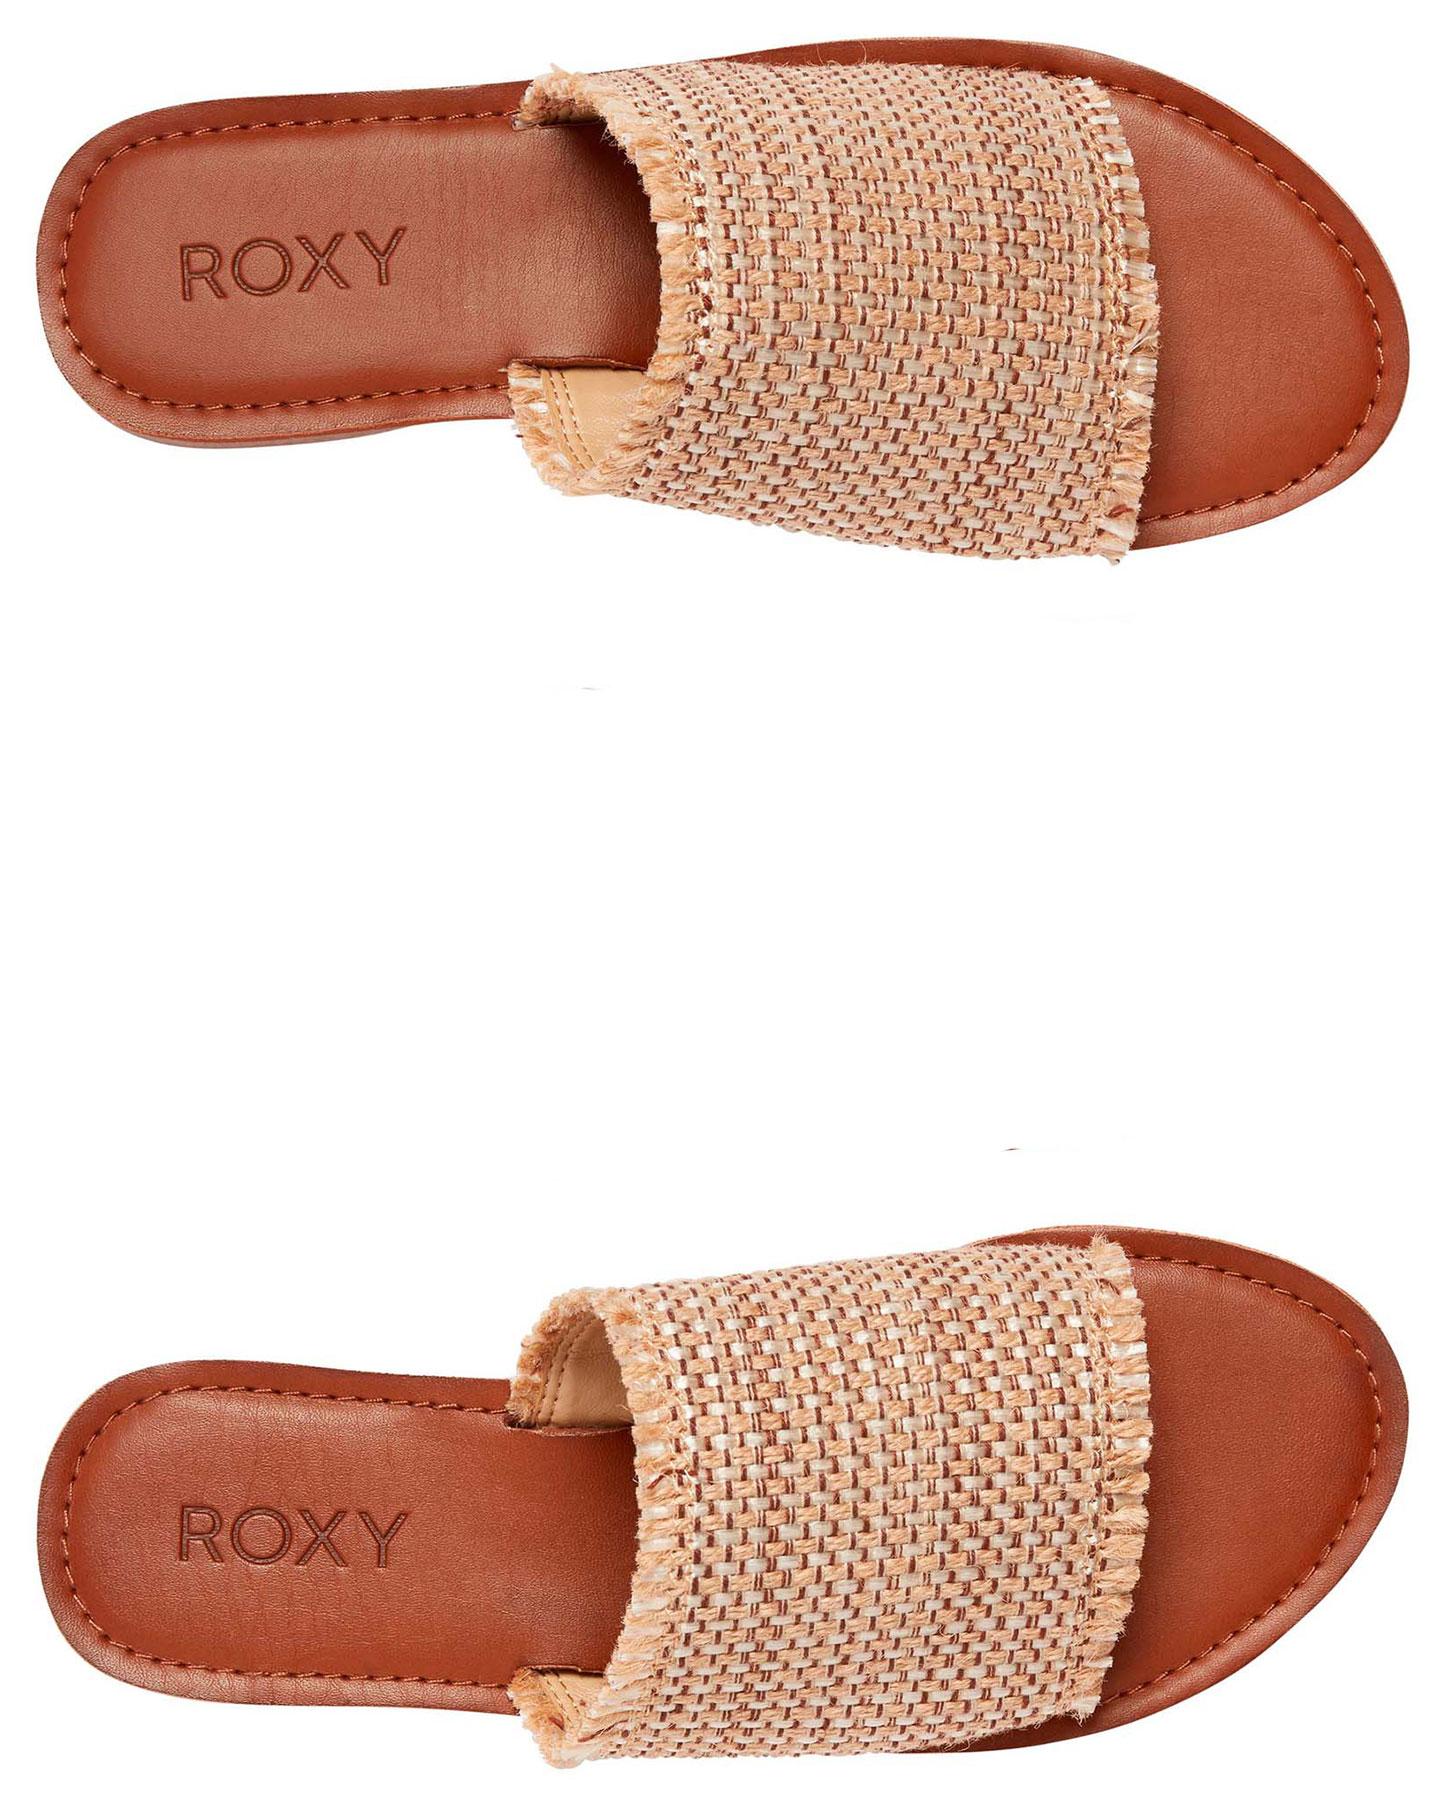 Roxy Womens Kaia Slide Sandals - Tan